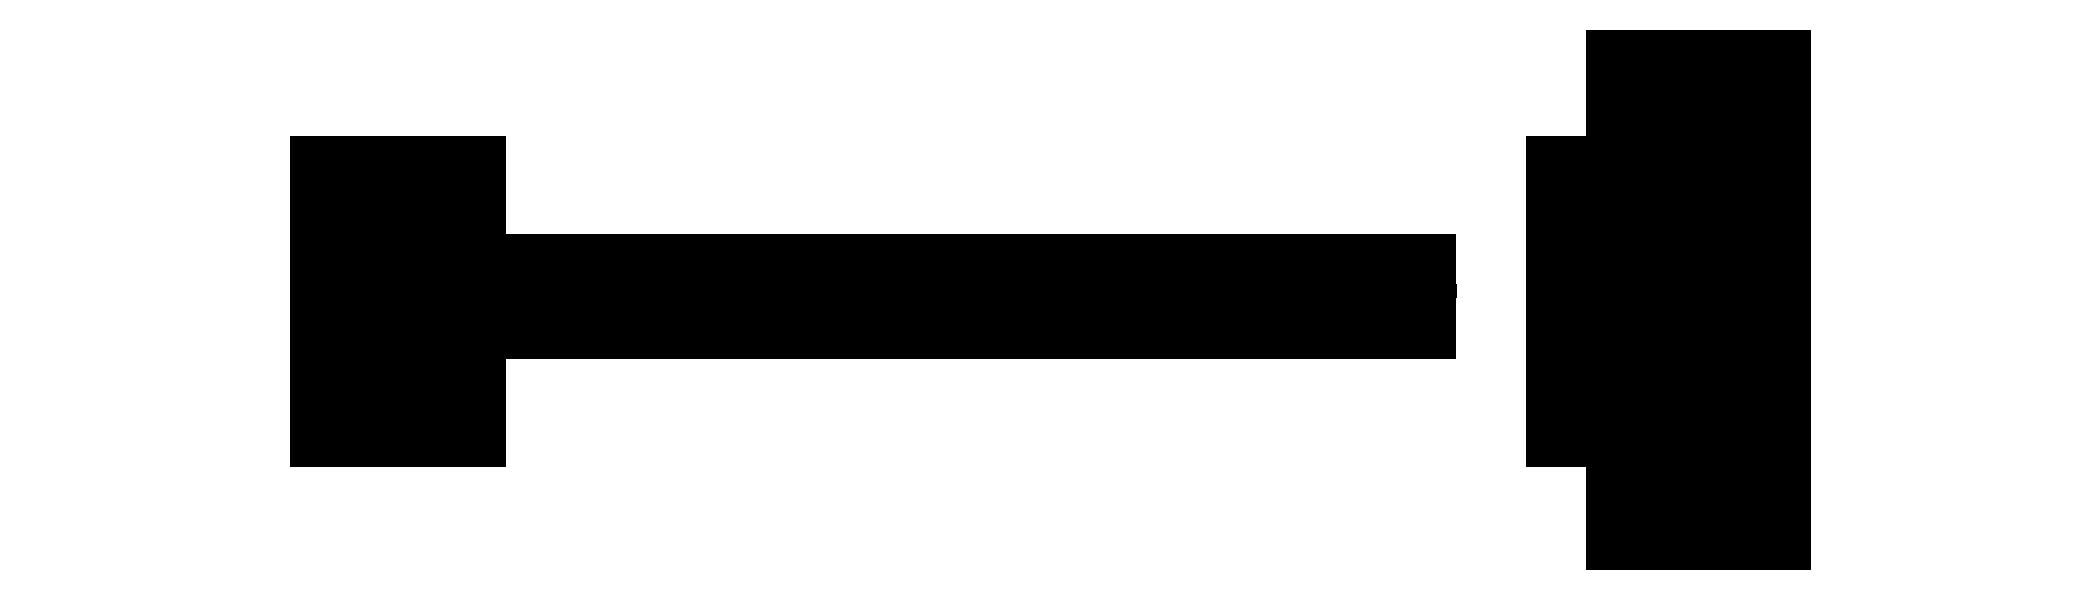 Matisyn Ficara